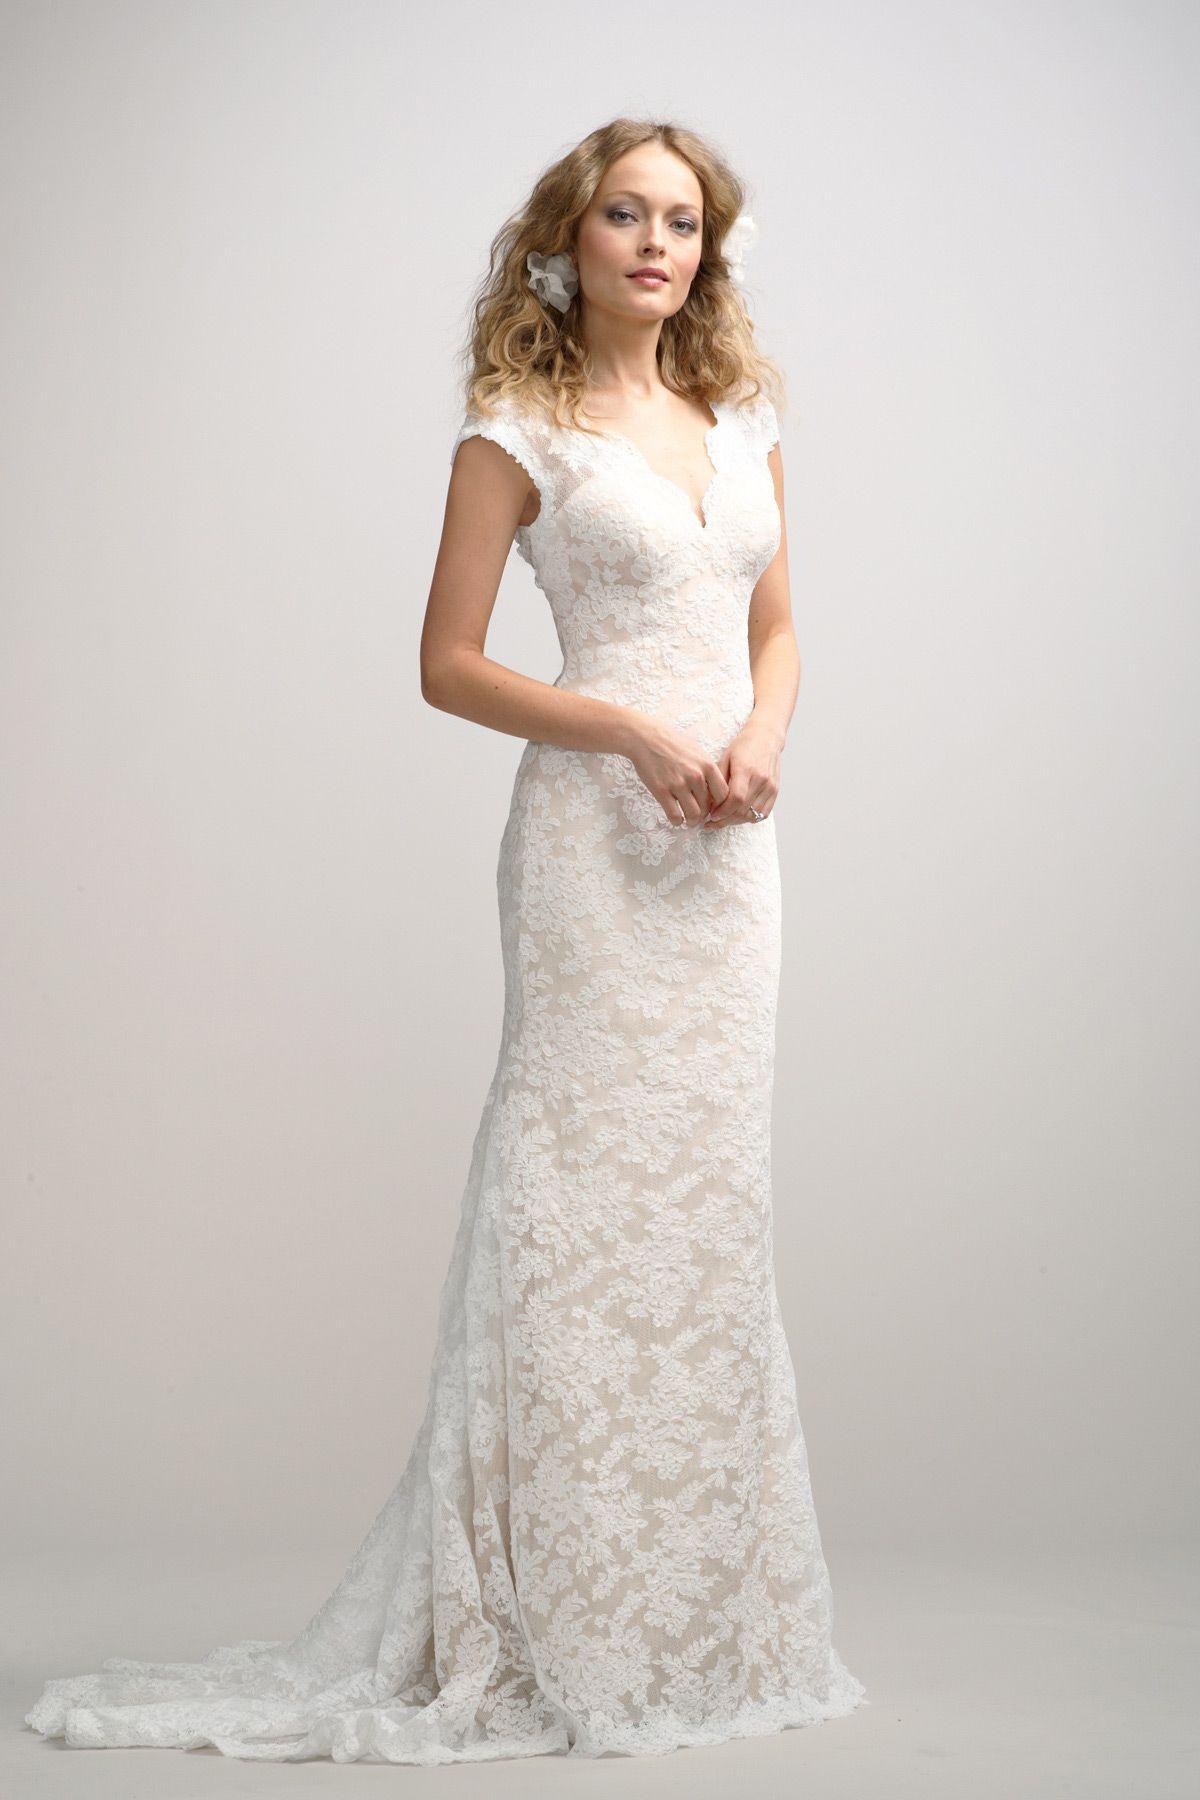 Pin by ledon garcia on that dress pinterest wedding dress